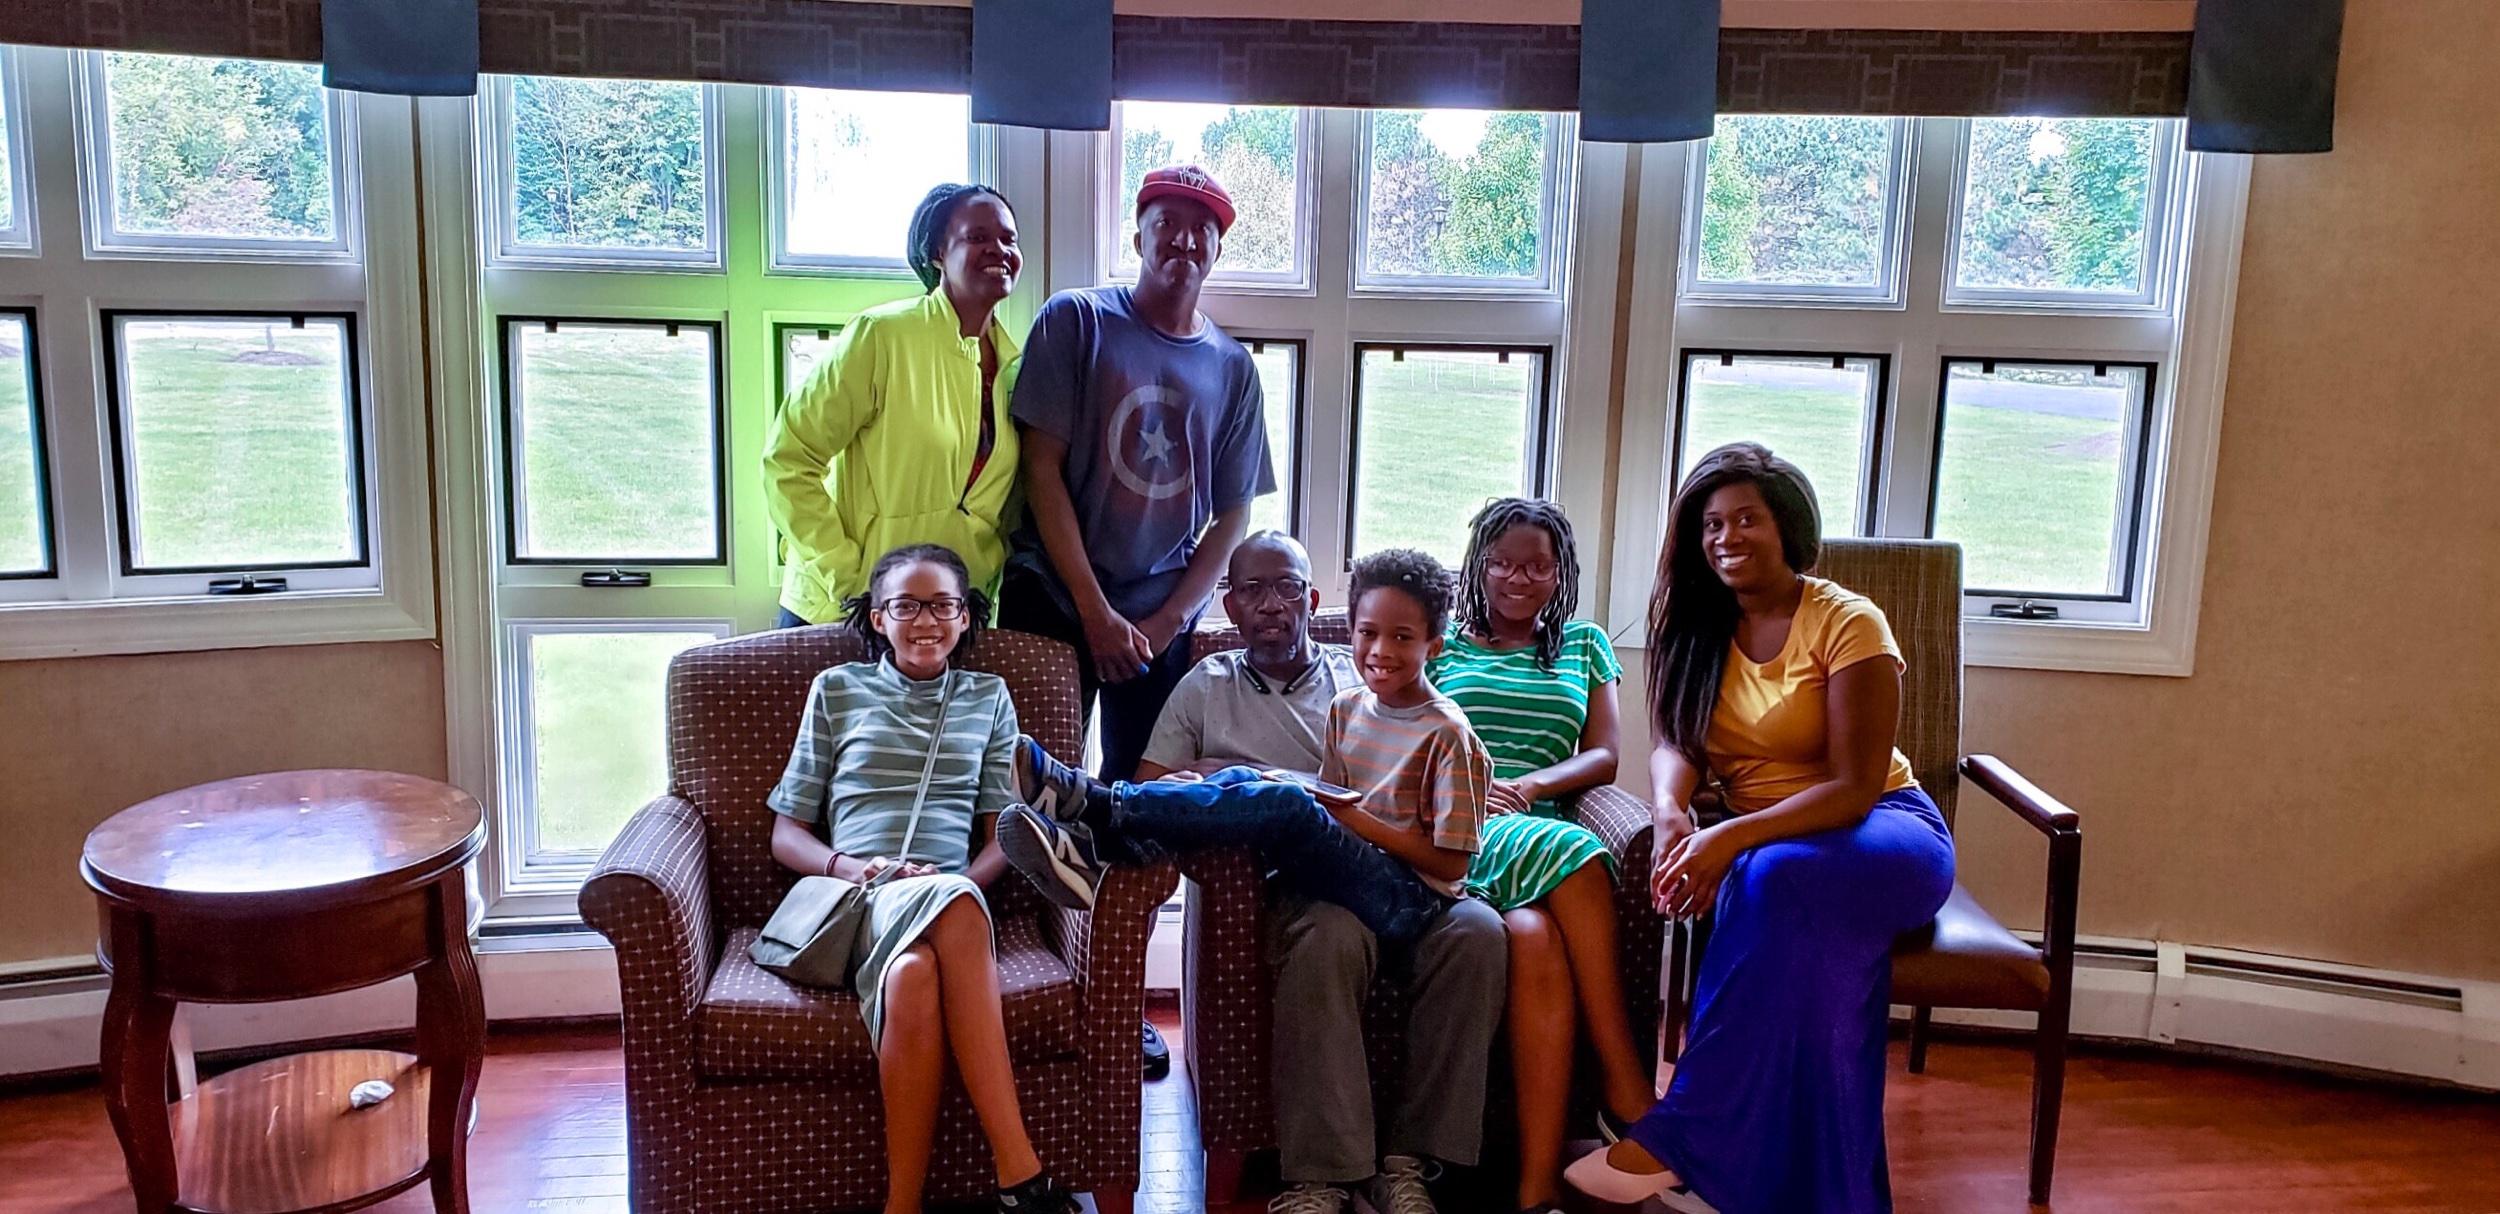 The White Family - My Family.